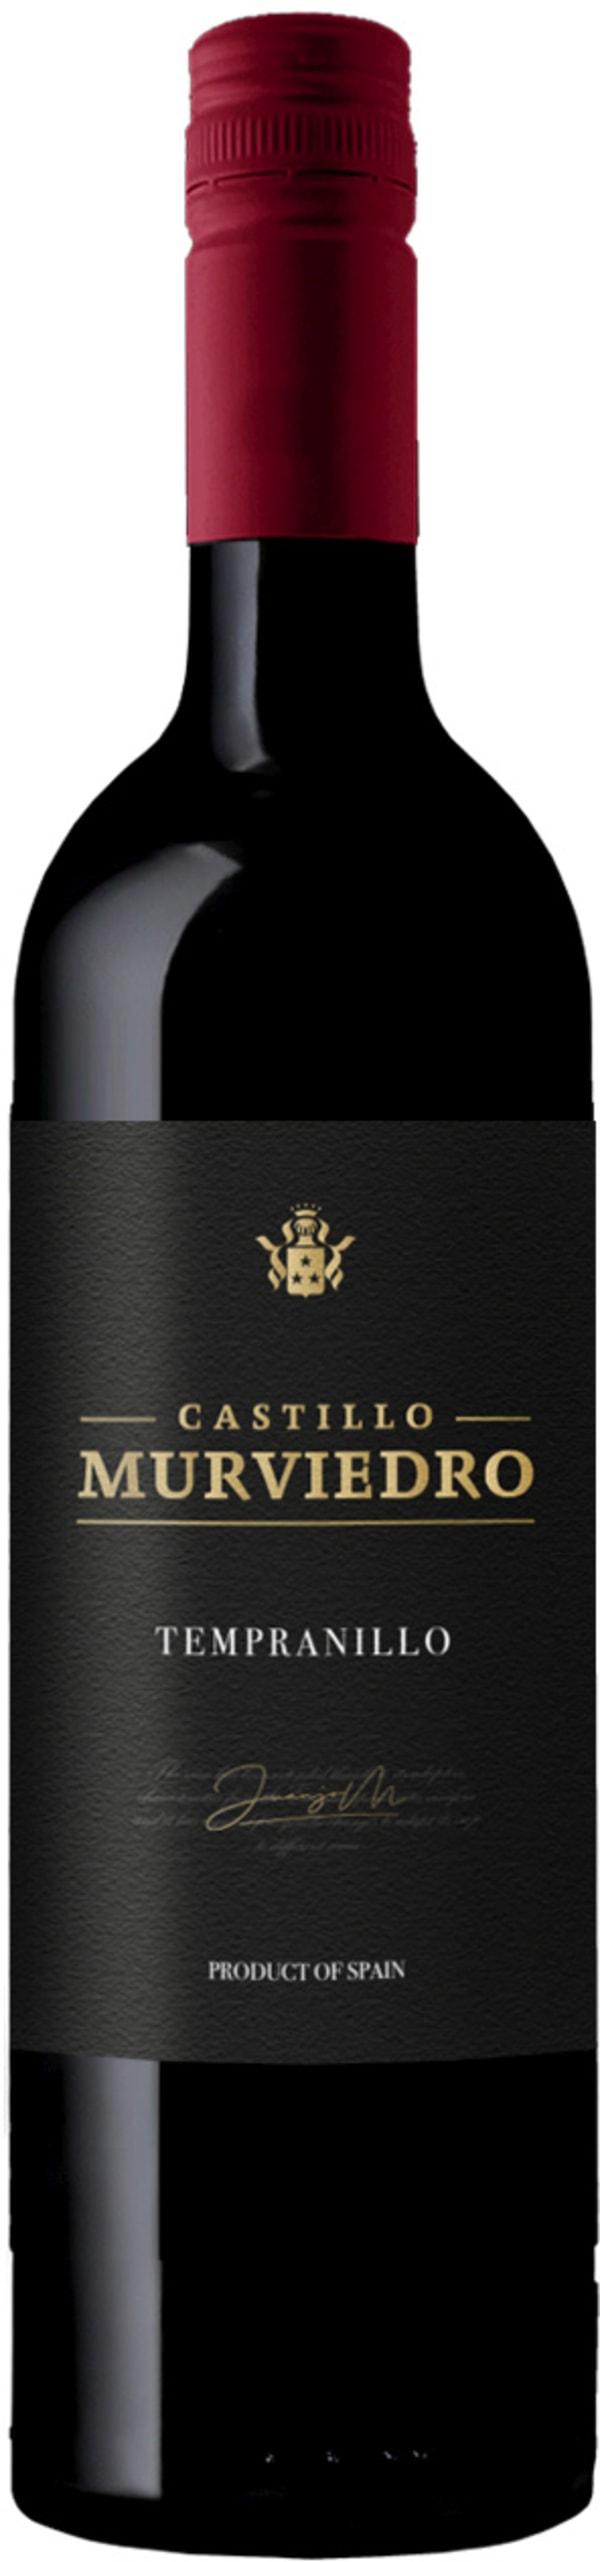 Castillo Murviedro Tempranillo 2016